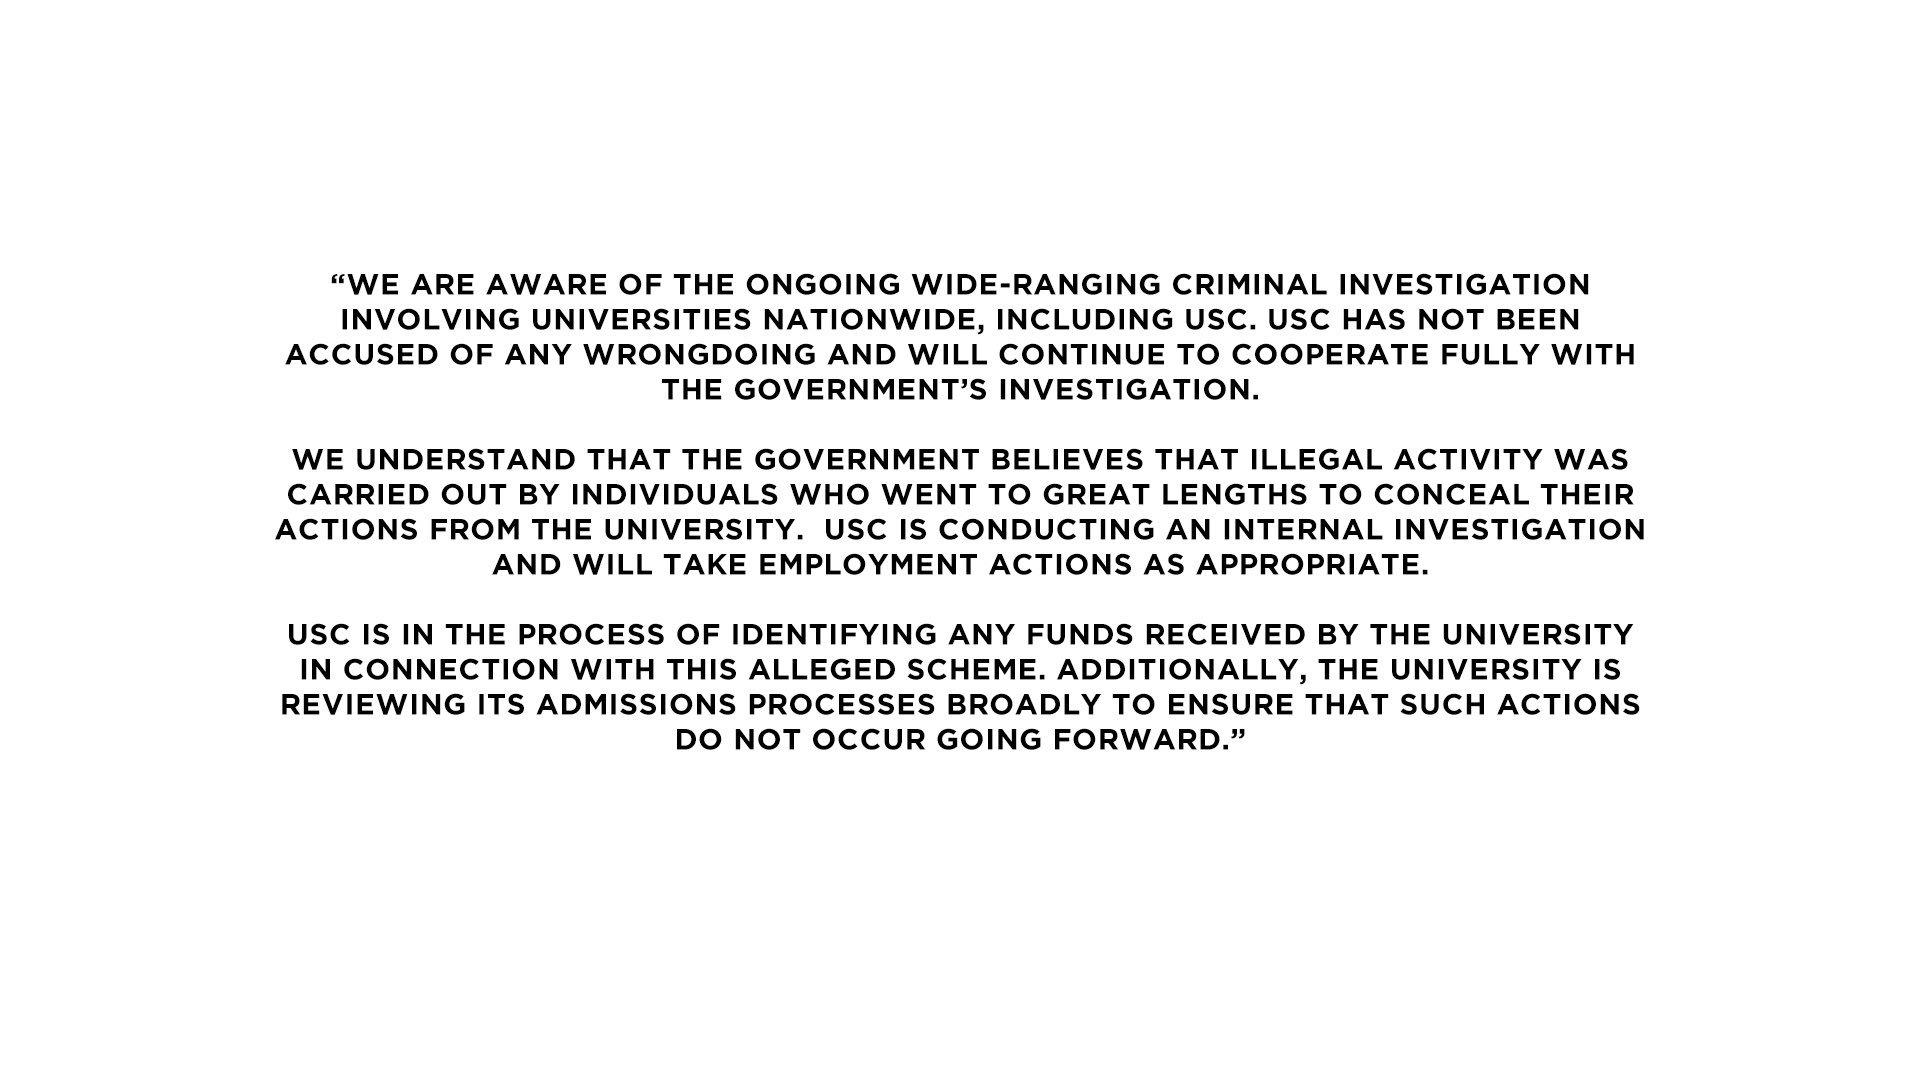 usc-statement-1552419730618.jpg